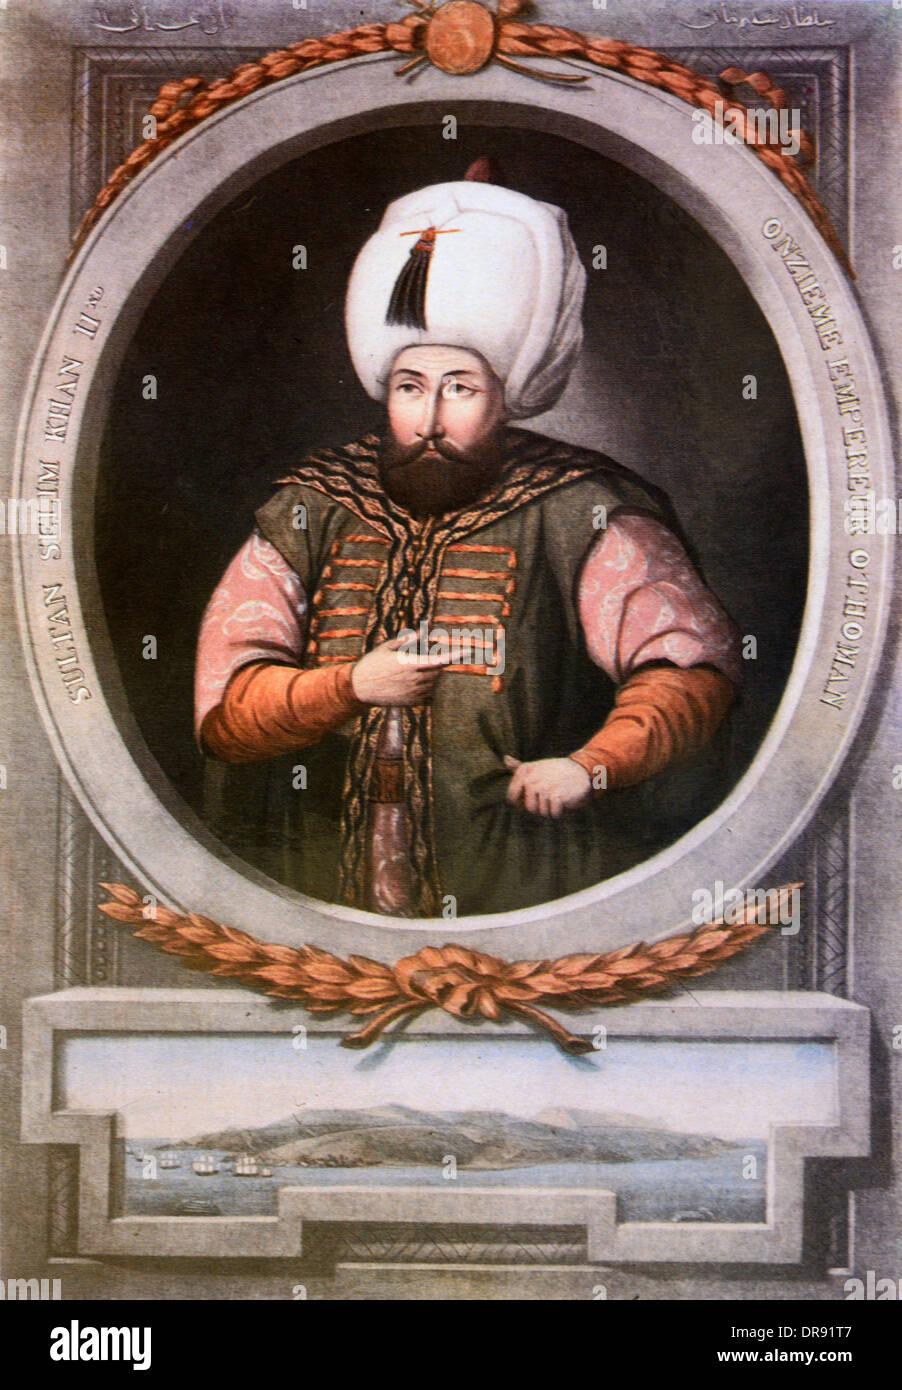 Turkish Ottoman Sultan Selim II (1524-1574) Portrait Painting - Stock Image